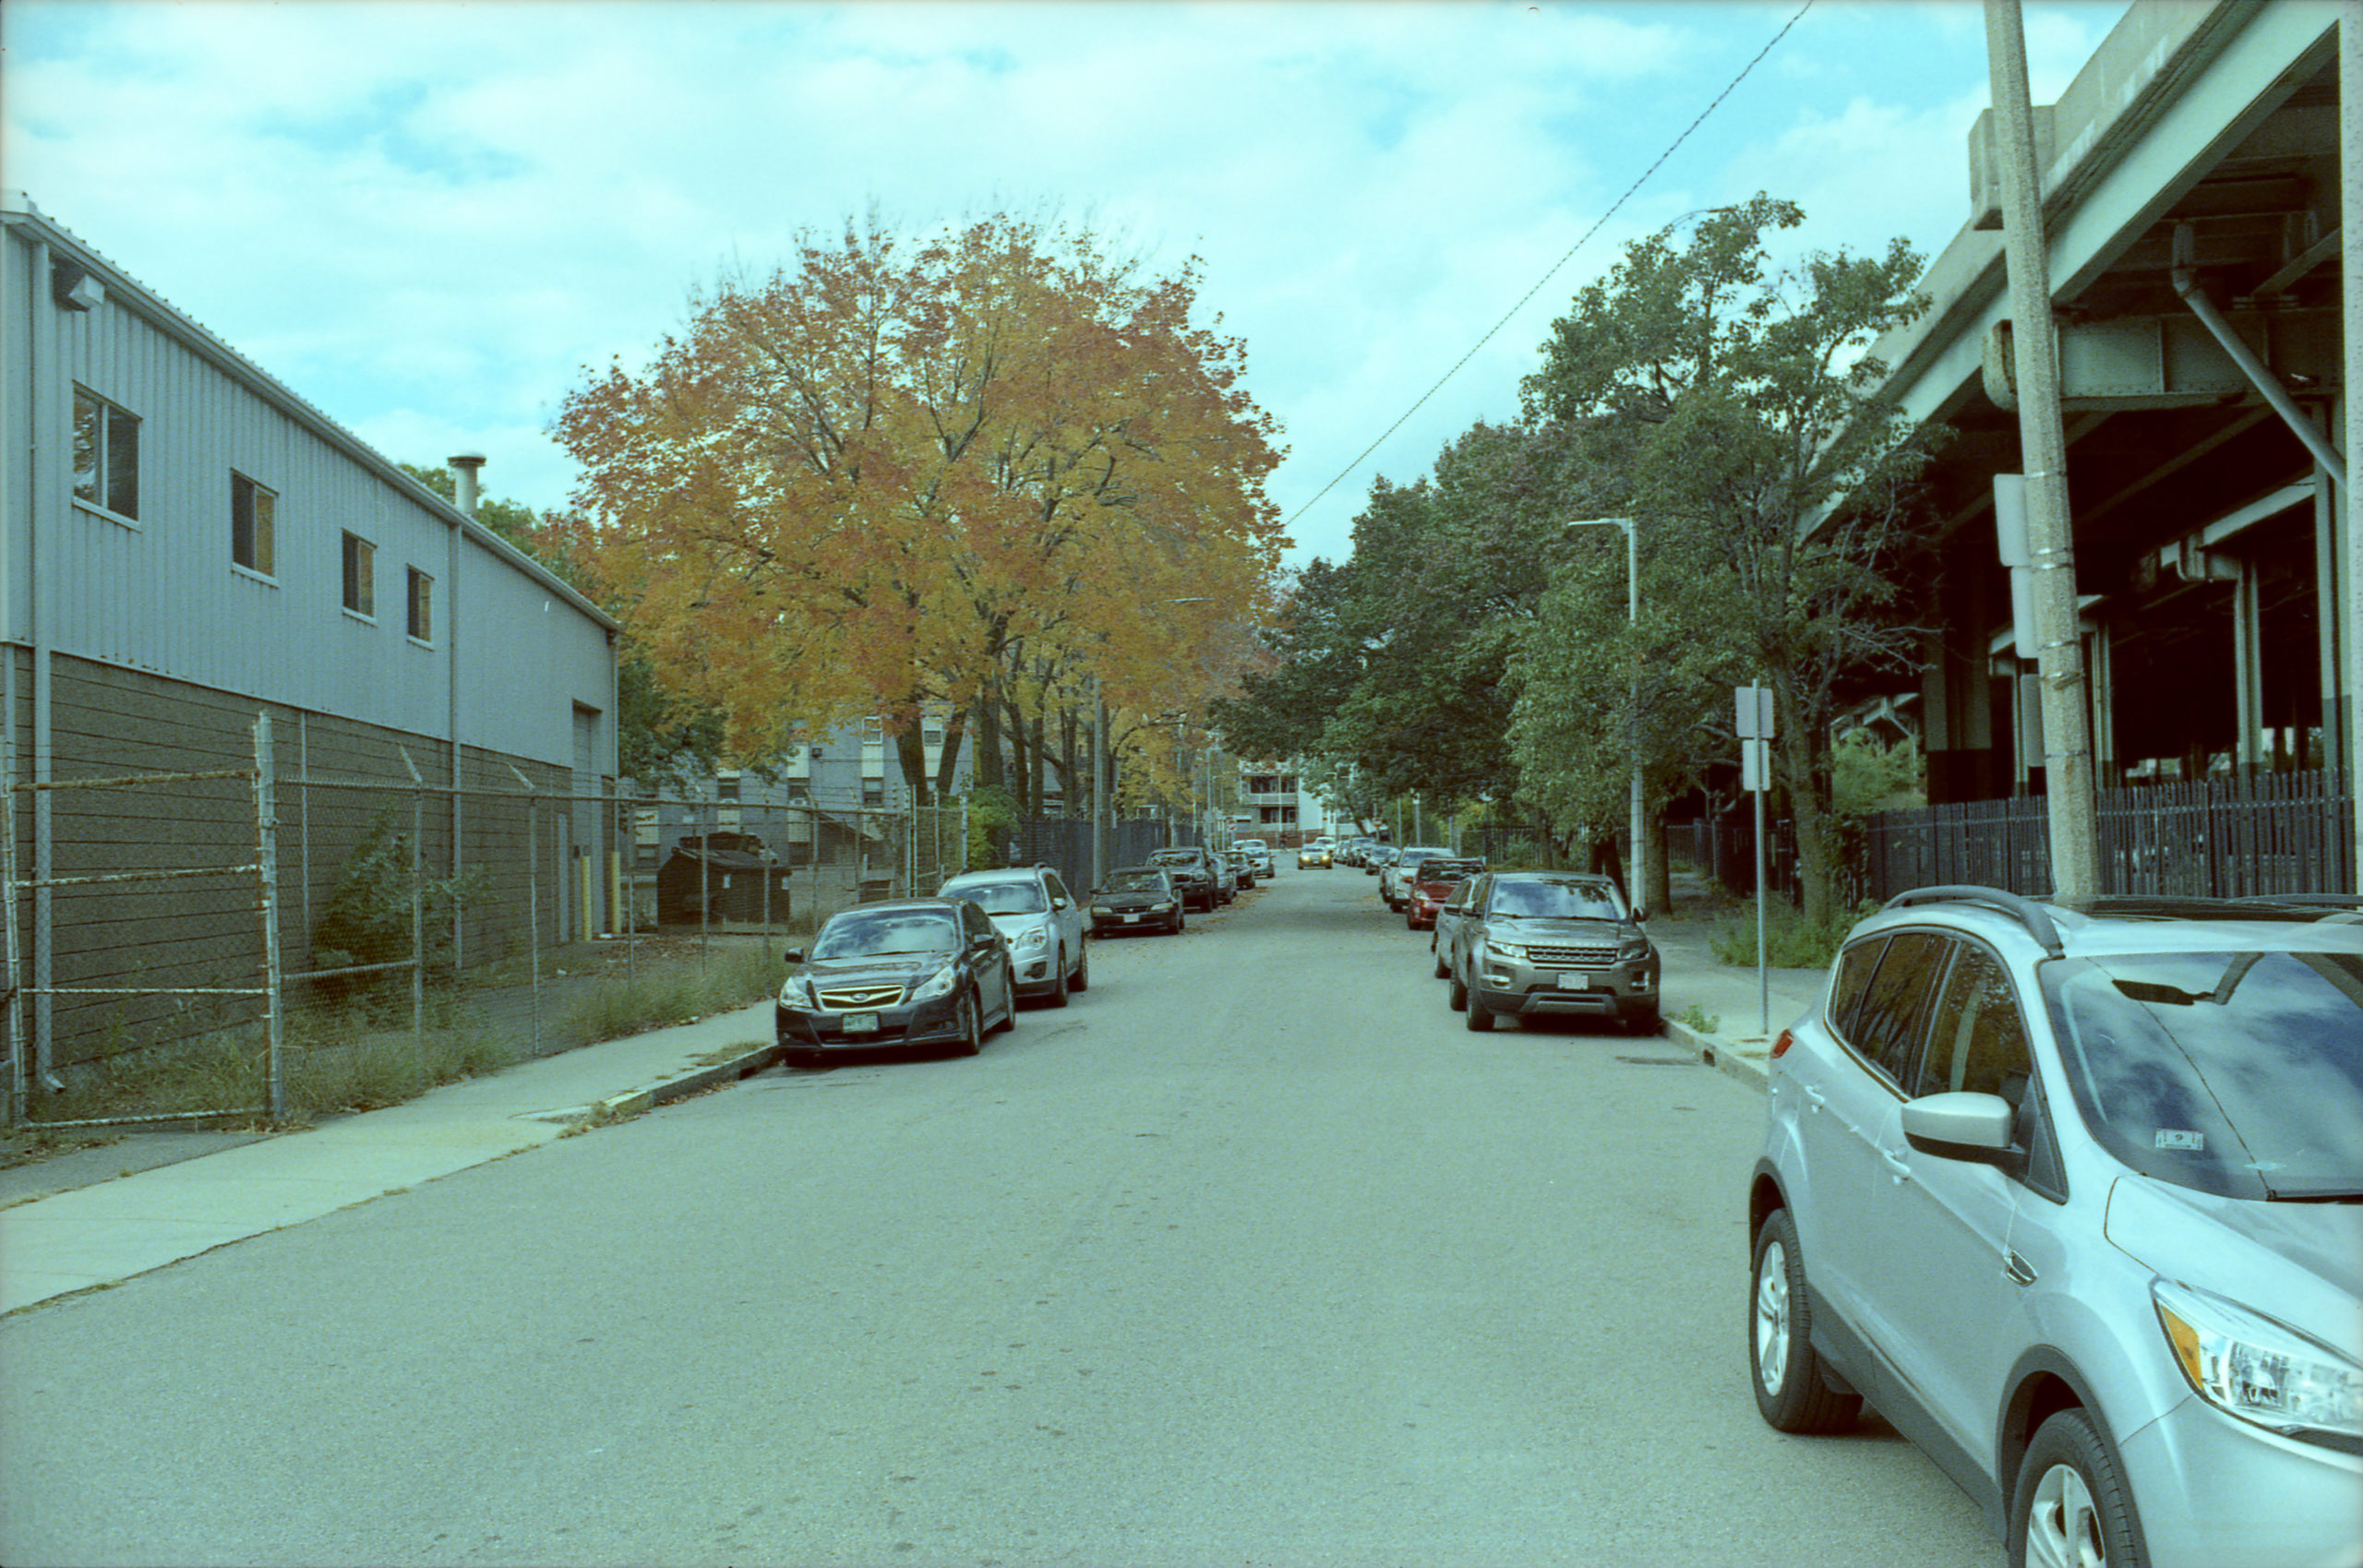 Cross-Processing Kodak's NEW Ektachrome Film - FilterGrade